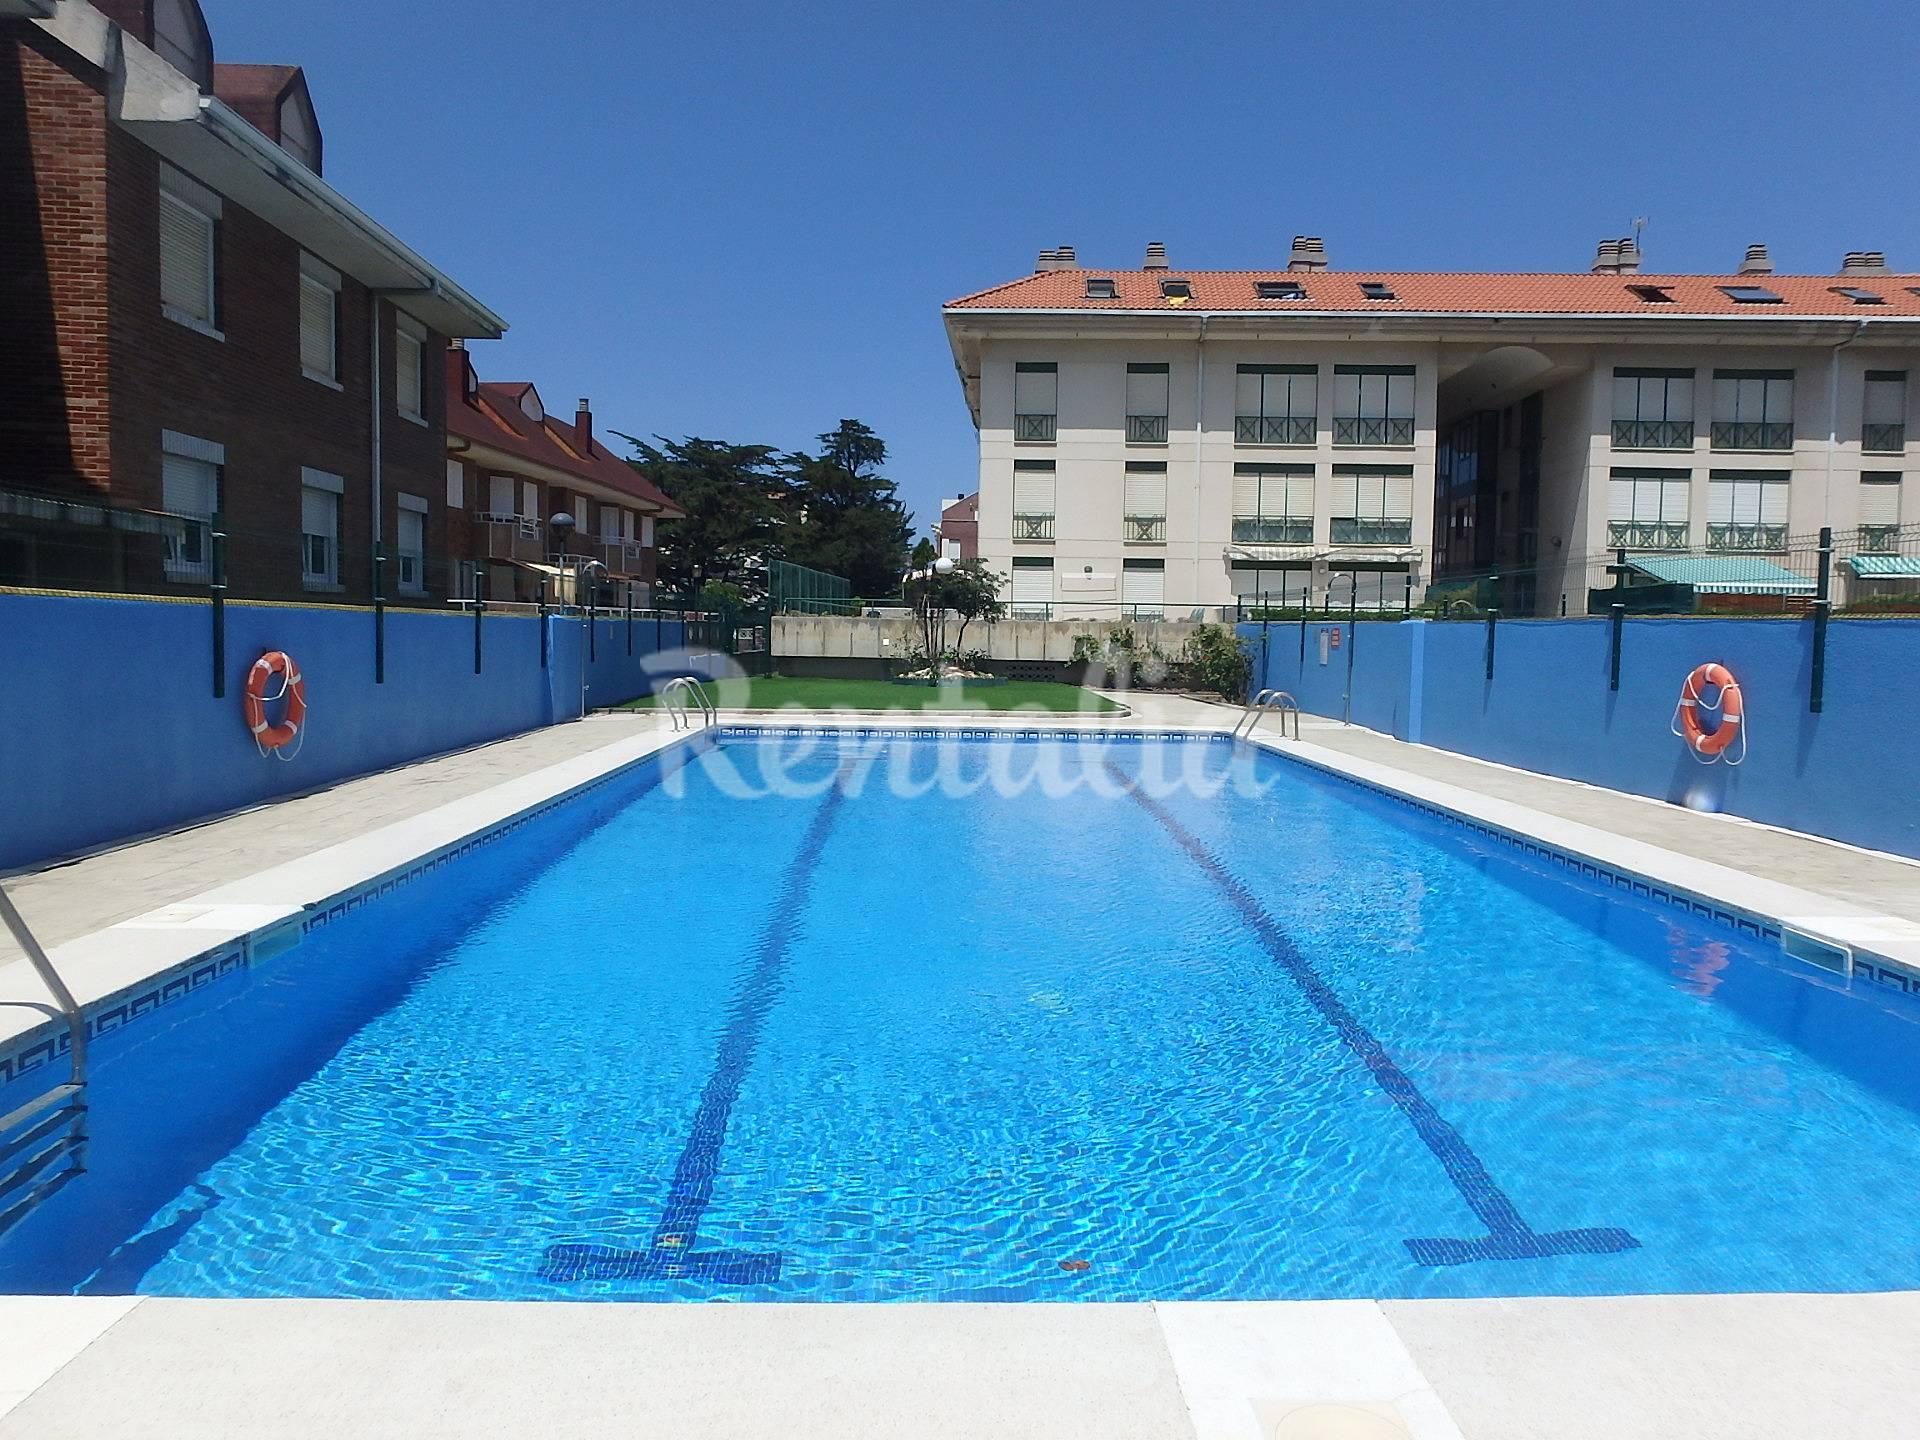 2 hab playa a 100 metros terraza 100 m2 piscina somo for Piscina 100 metros portugal